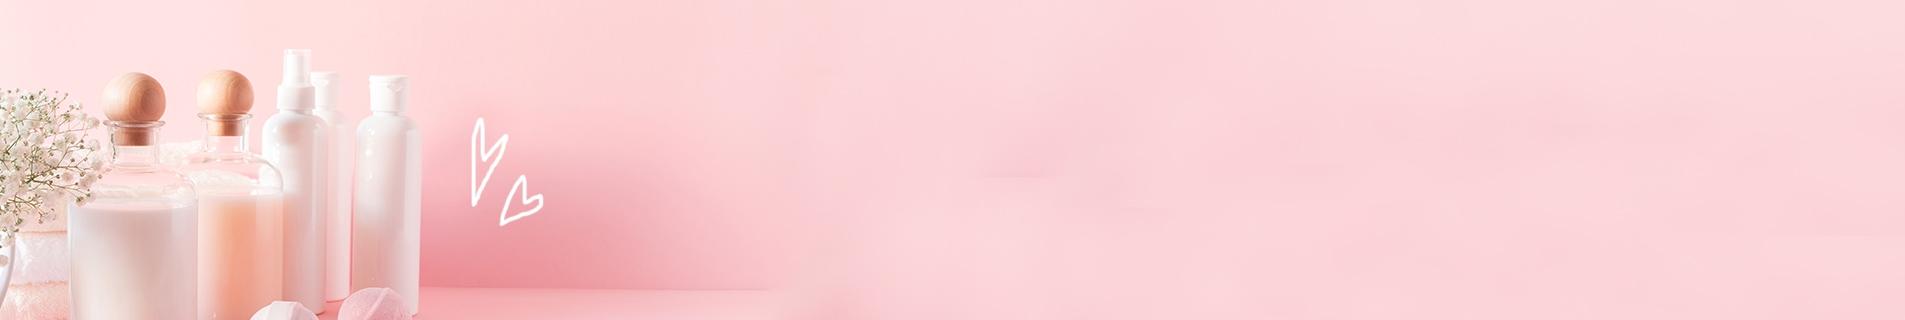 Promo moins de 2€   Site de maquillage pas cher   SAGA Cosmetics